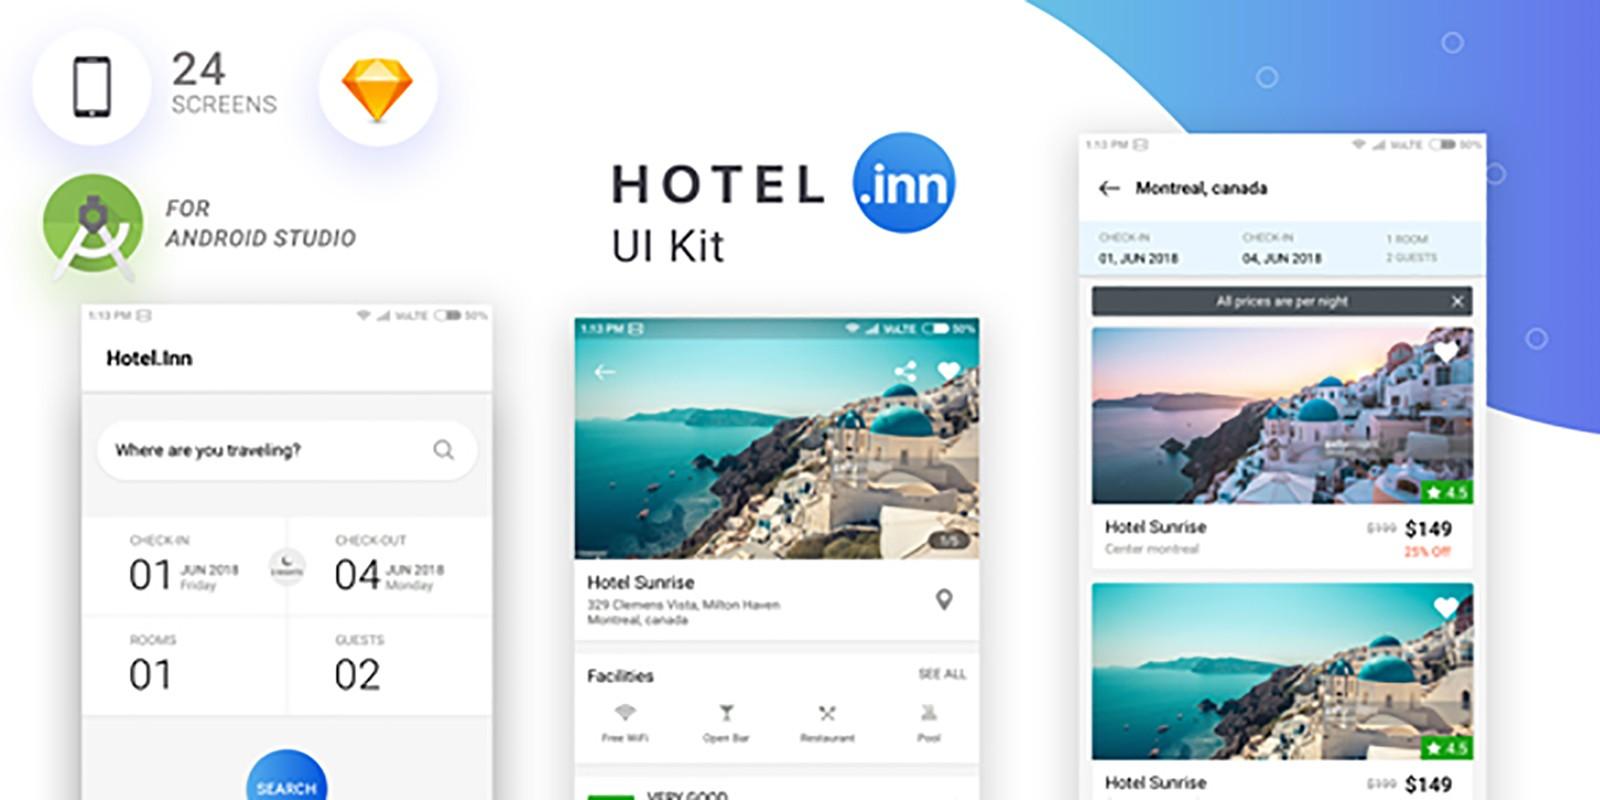 Hotel-Inn Android Studio UI KIT